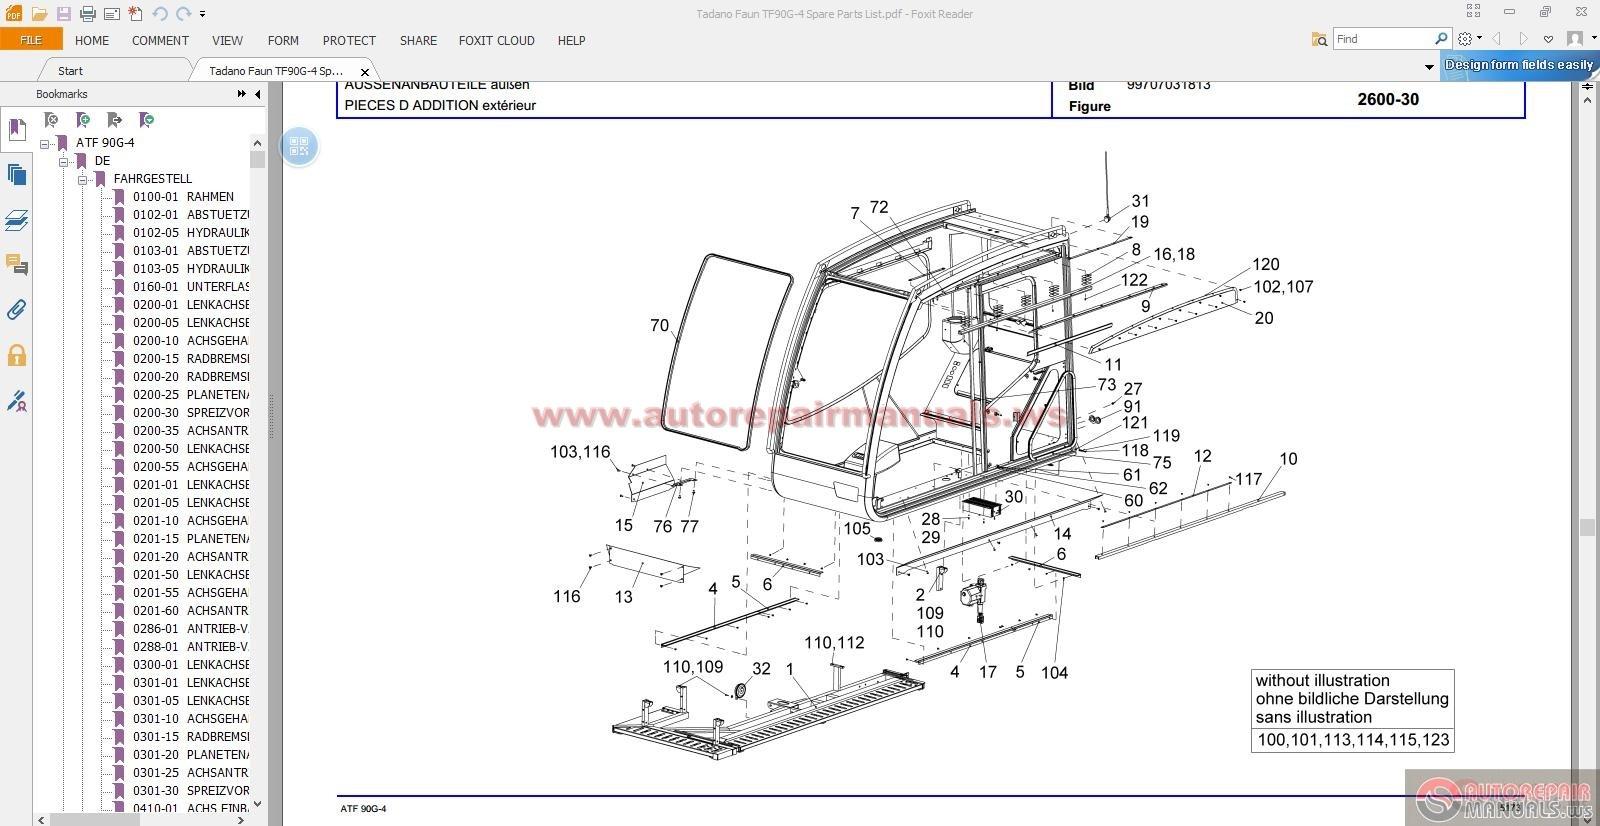 Tadano Crane Spare Parts Uae : Tadano faun atf g spare parts list auto repair manual